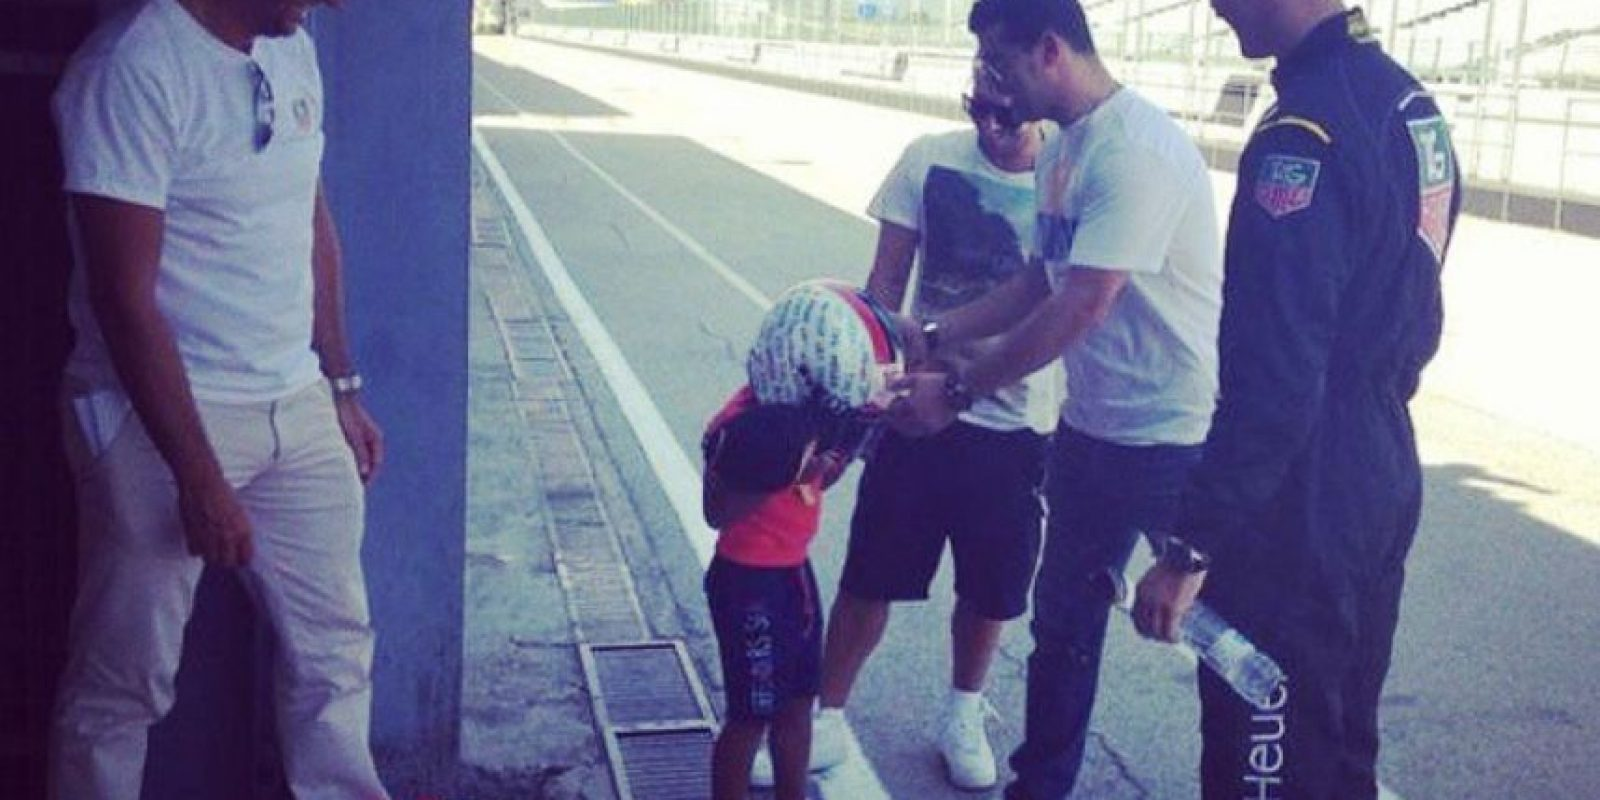 El pequeño Cristiano como piloto de carreras. Foto:instagram.com/cristiano